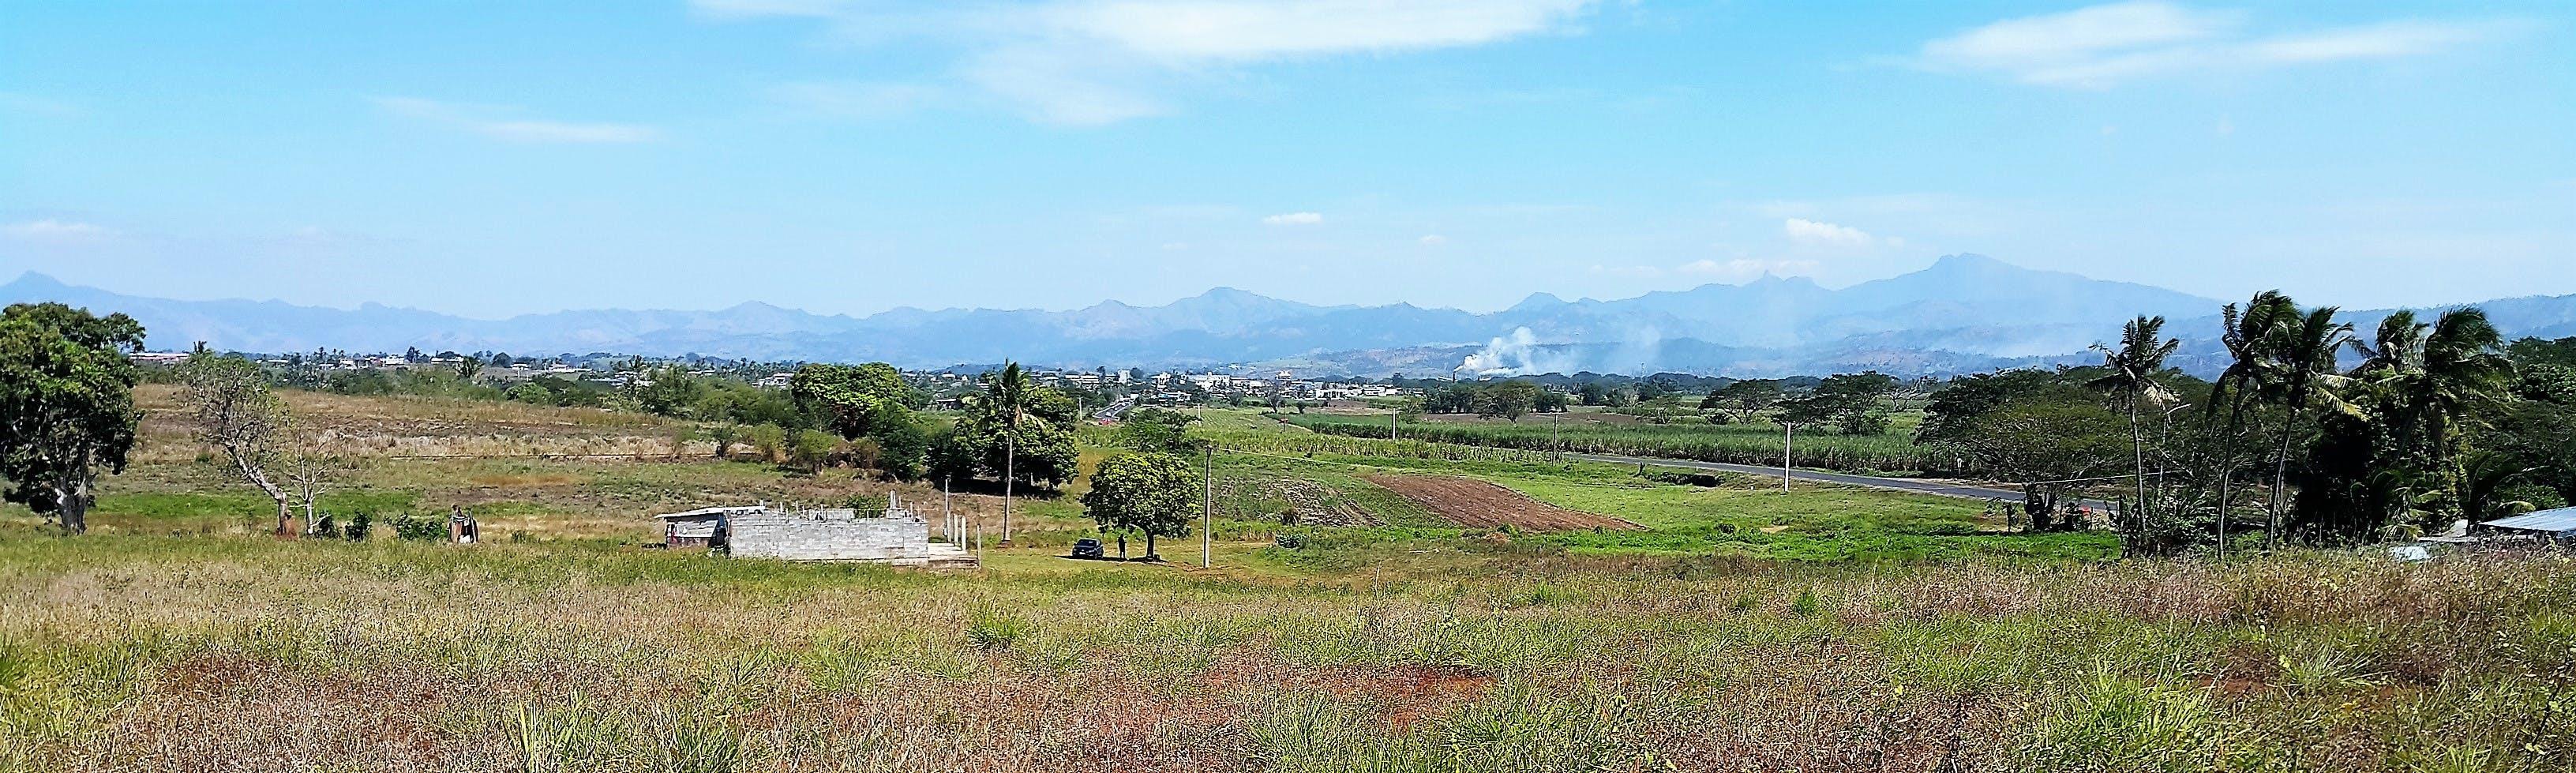 9.41 Acre Farmland For Sale